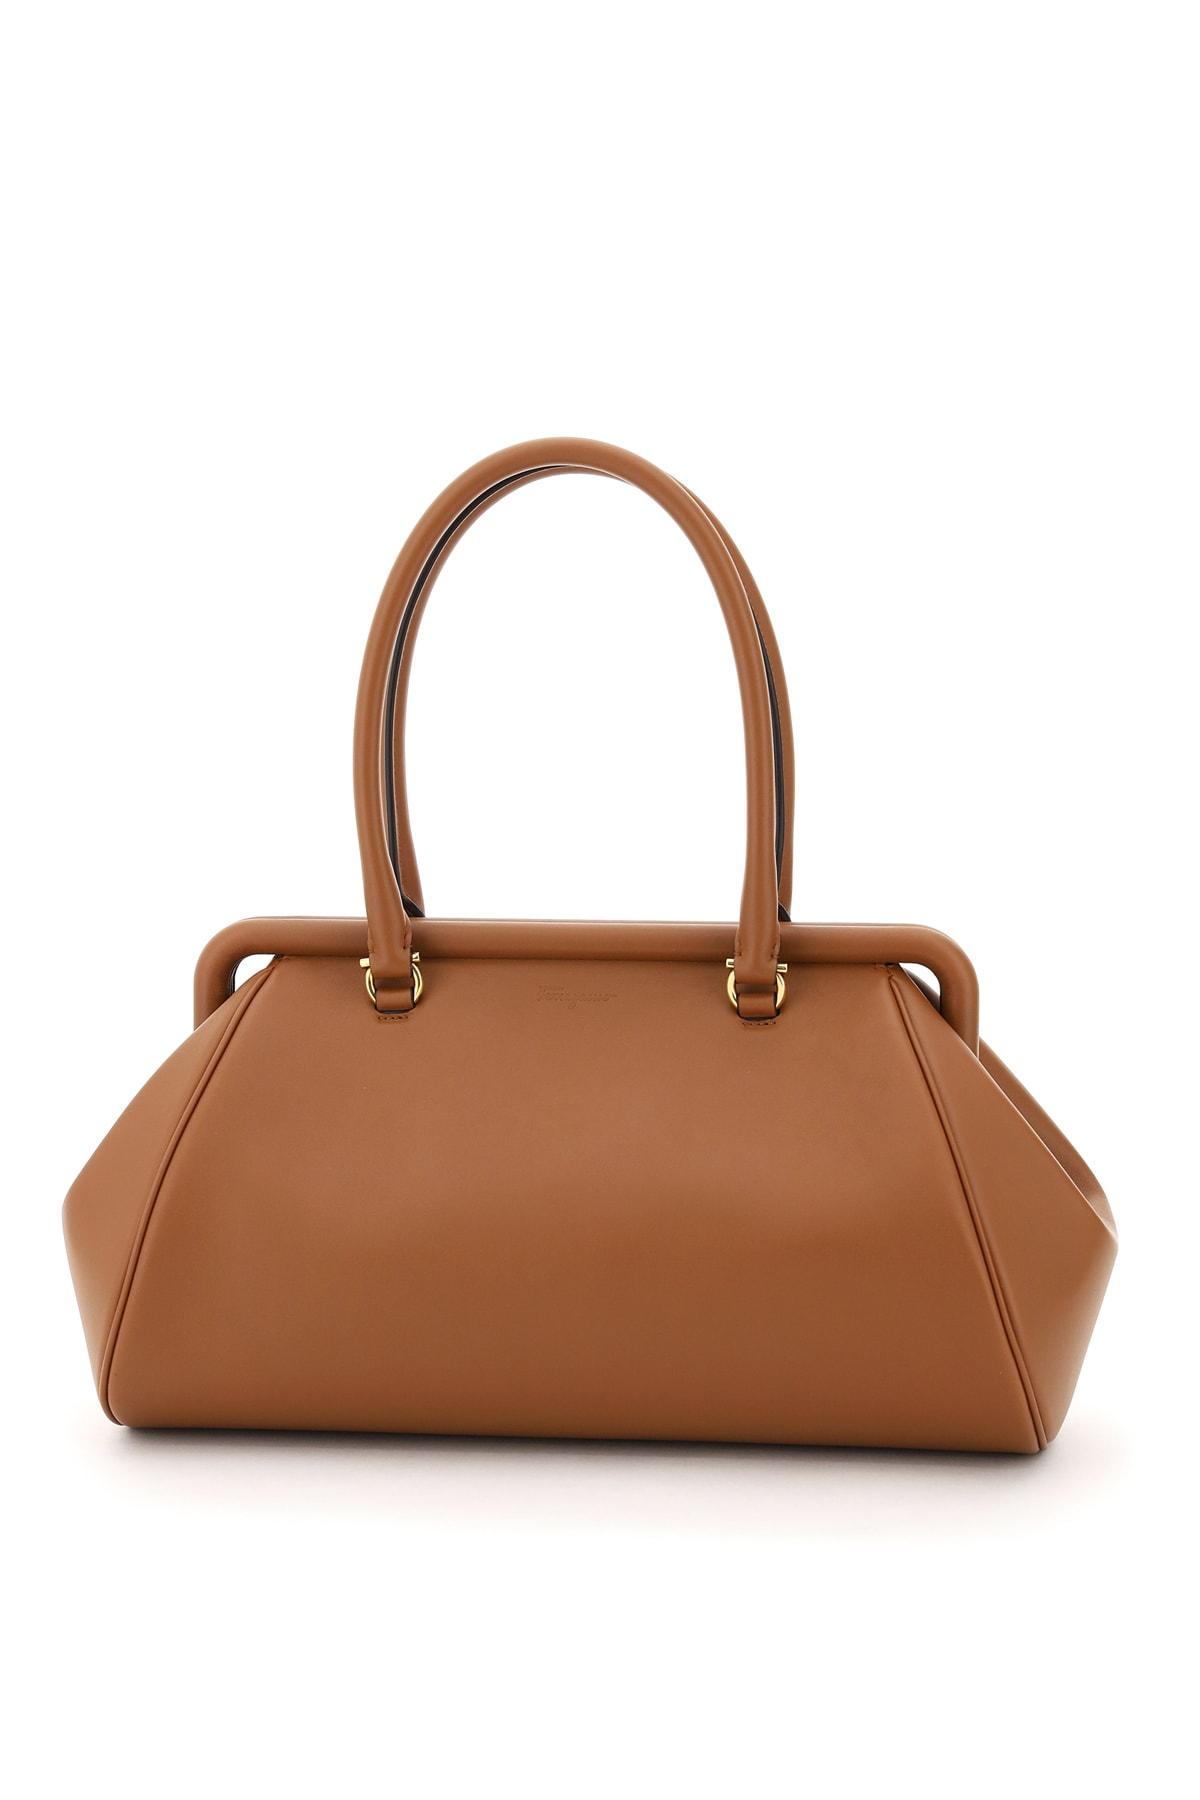 Salvatore Ferragamo Frame Shoulder Bag